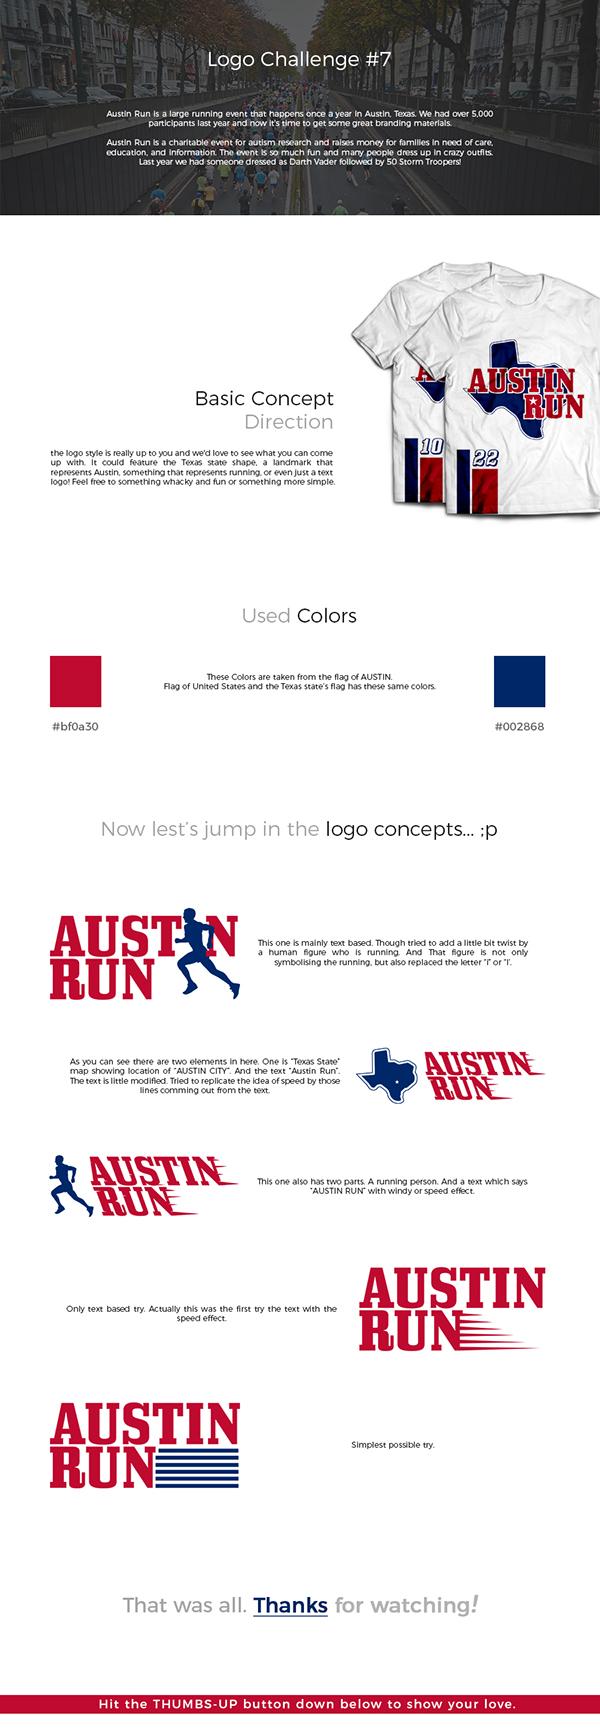 Austin Run Logo On Student Show